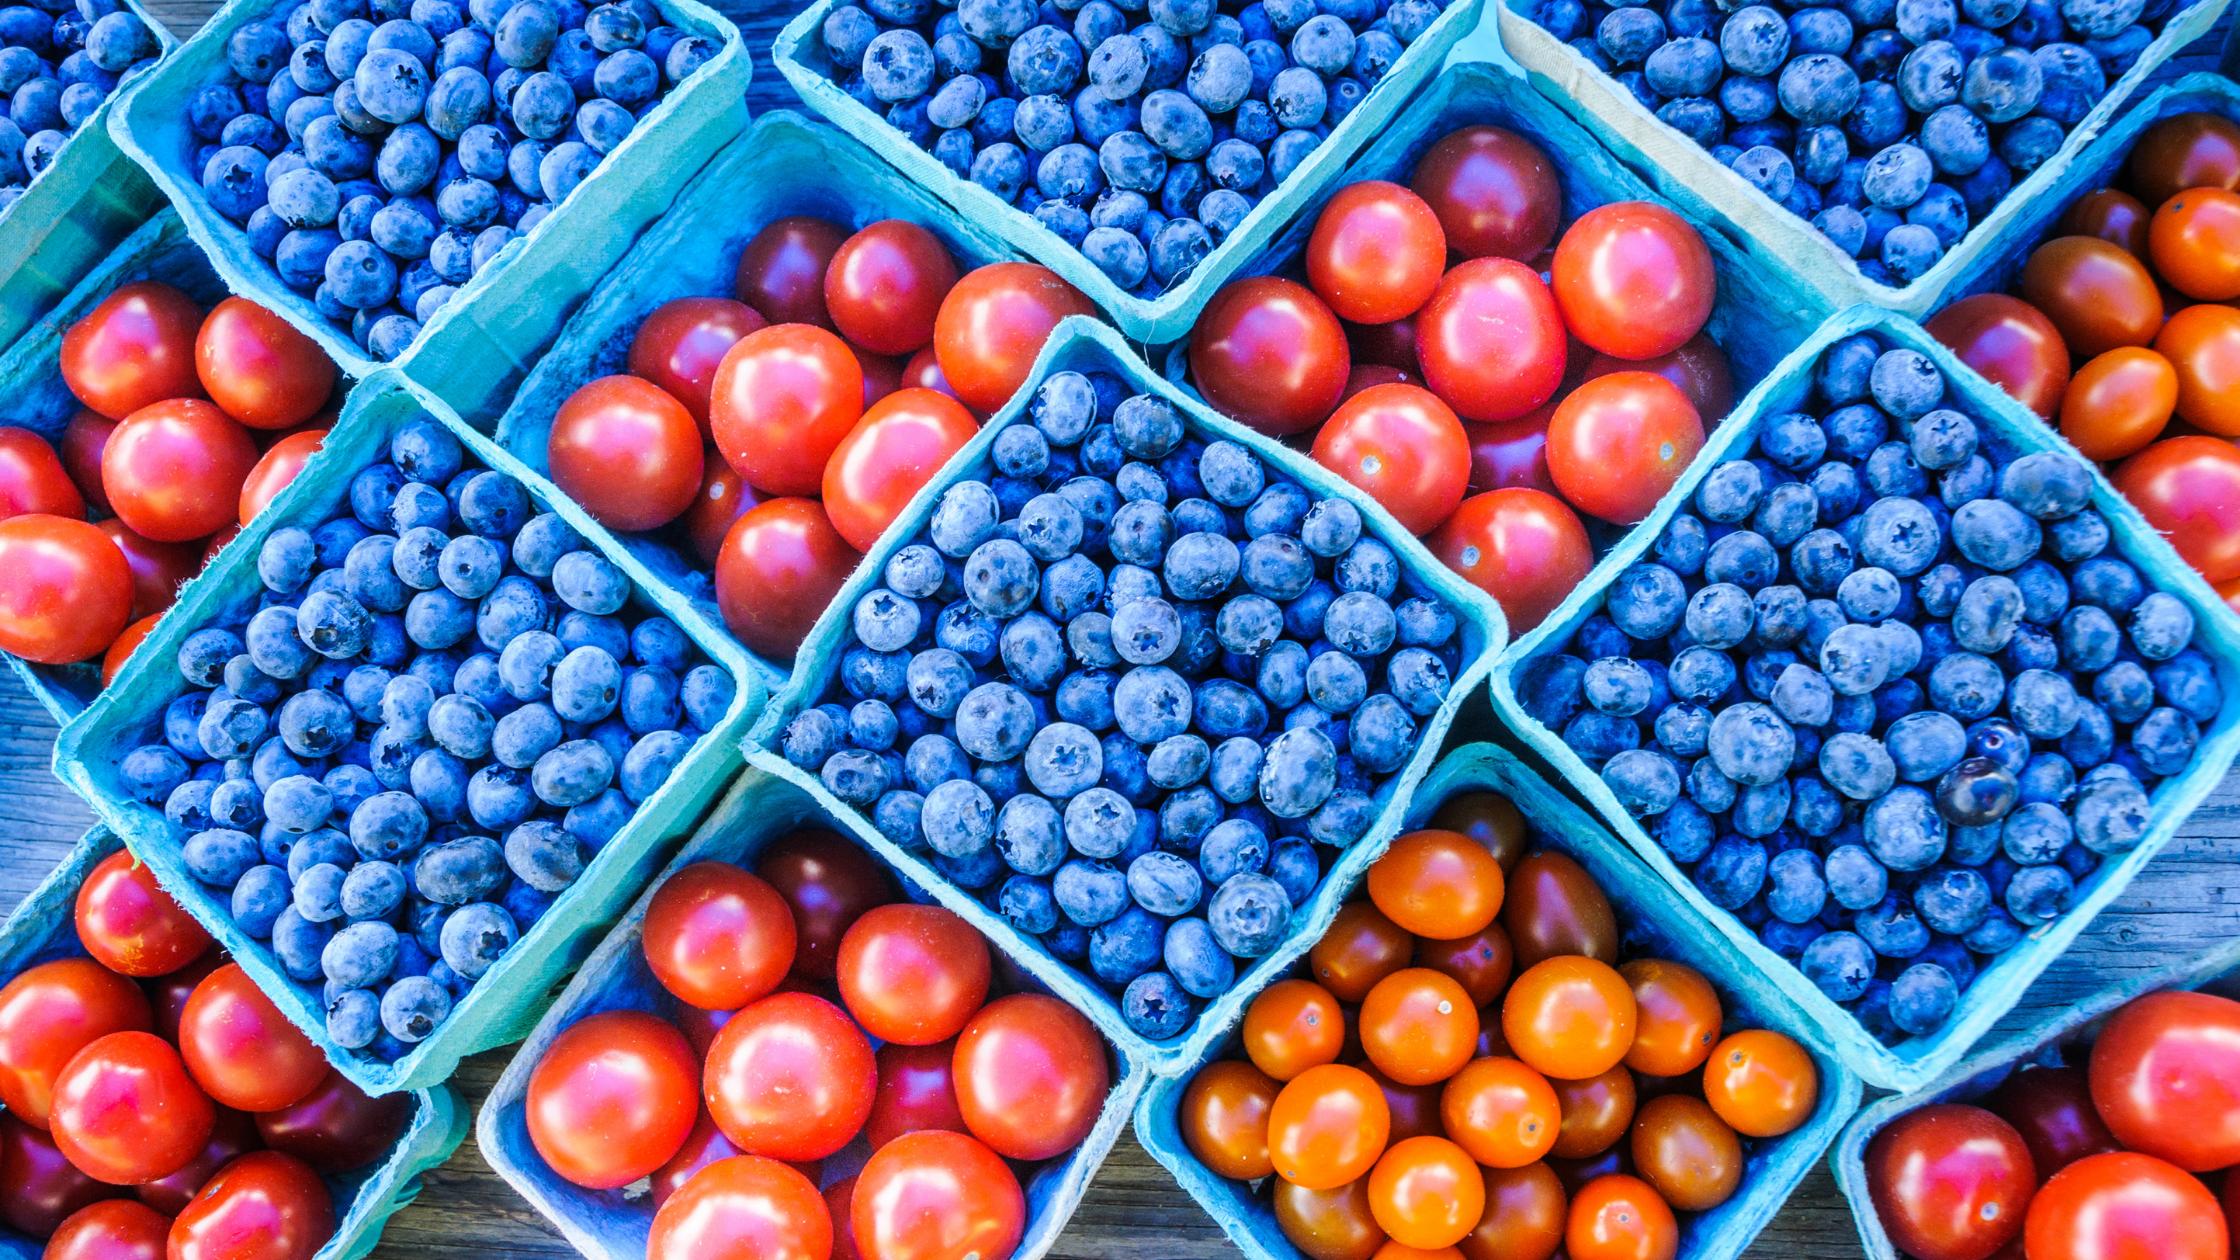 Summer Produce Storage